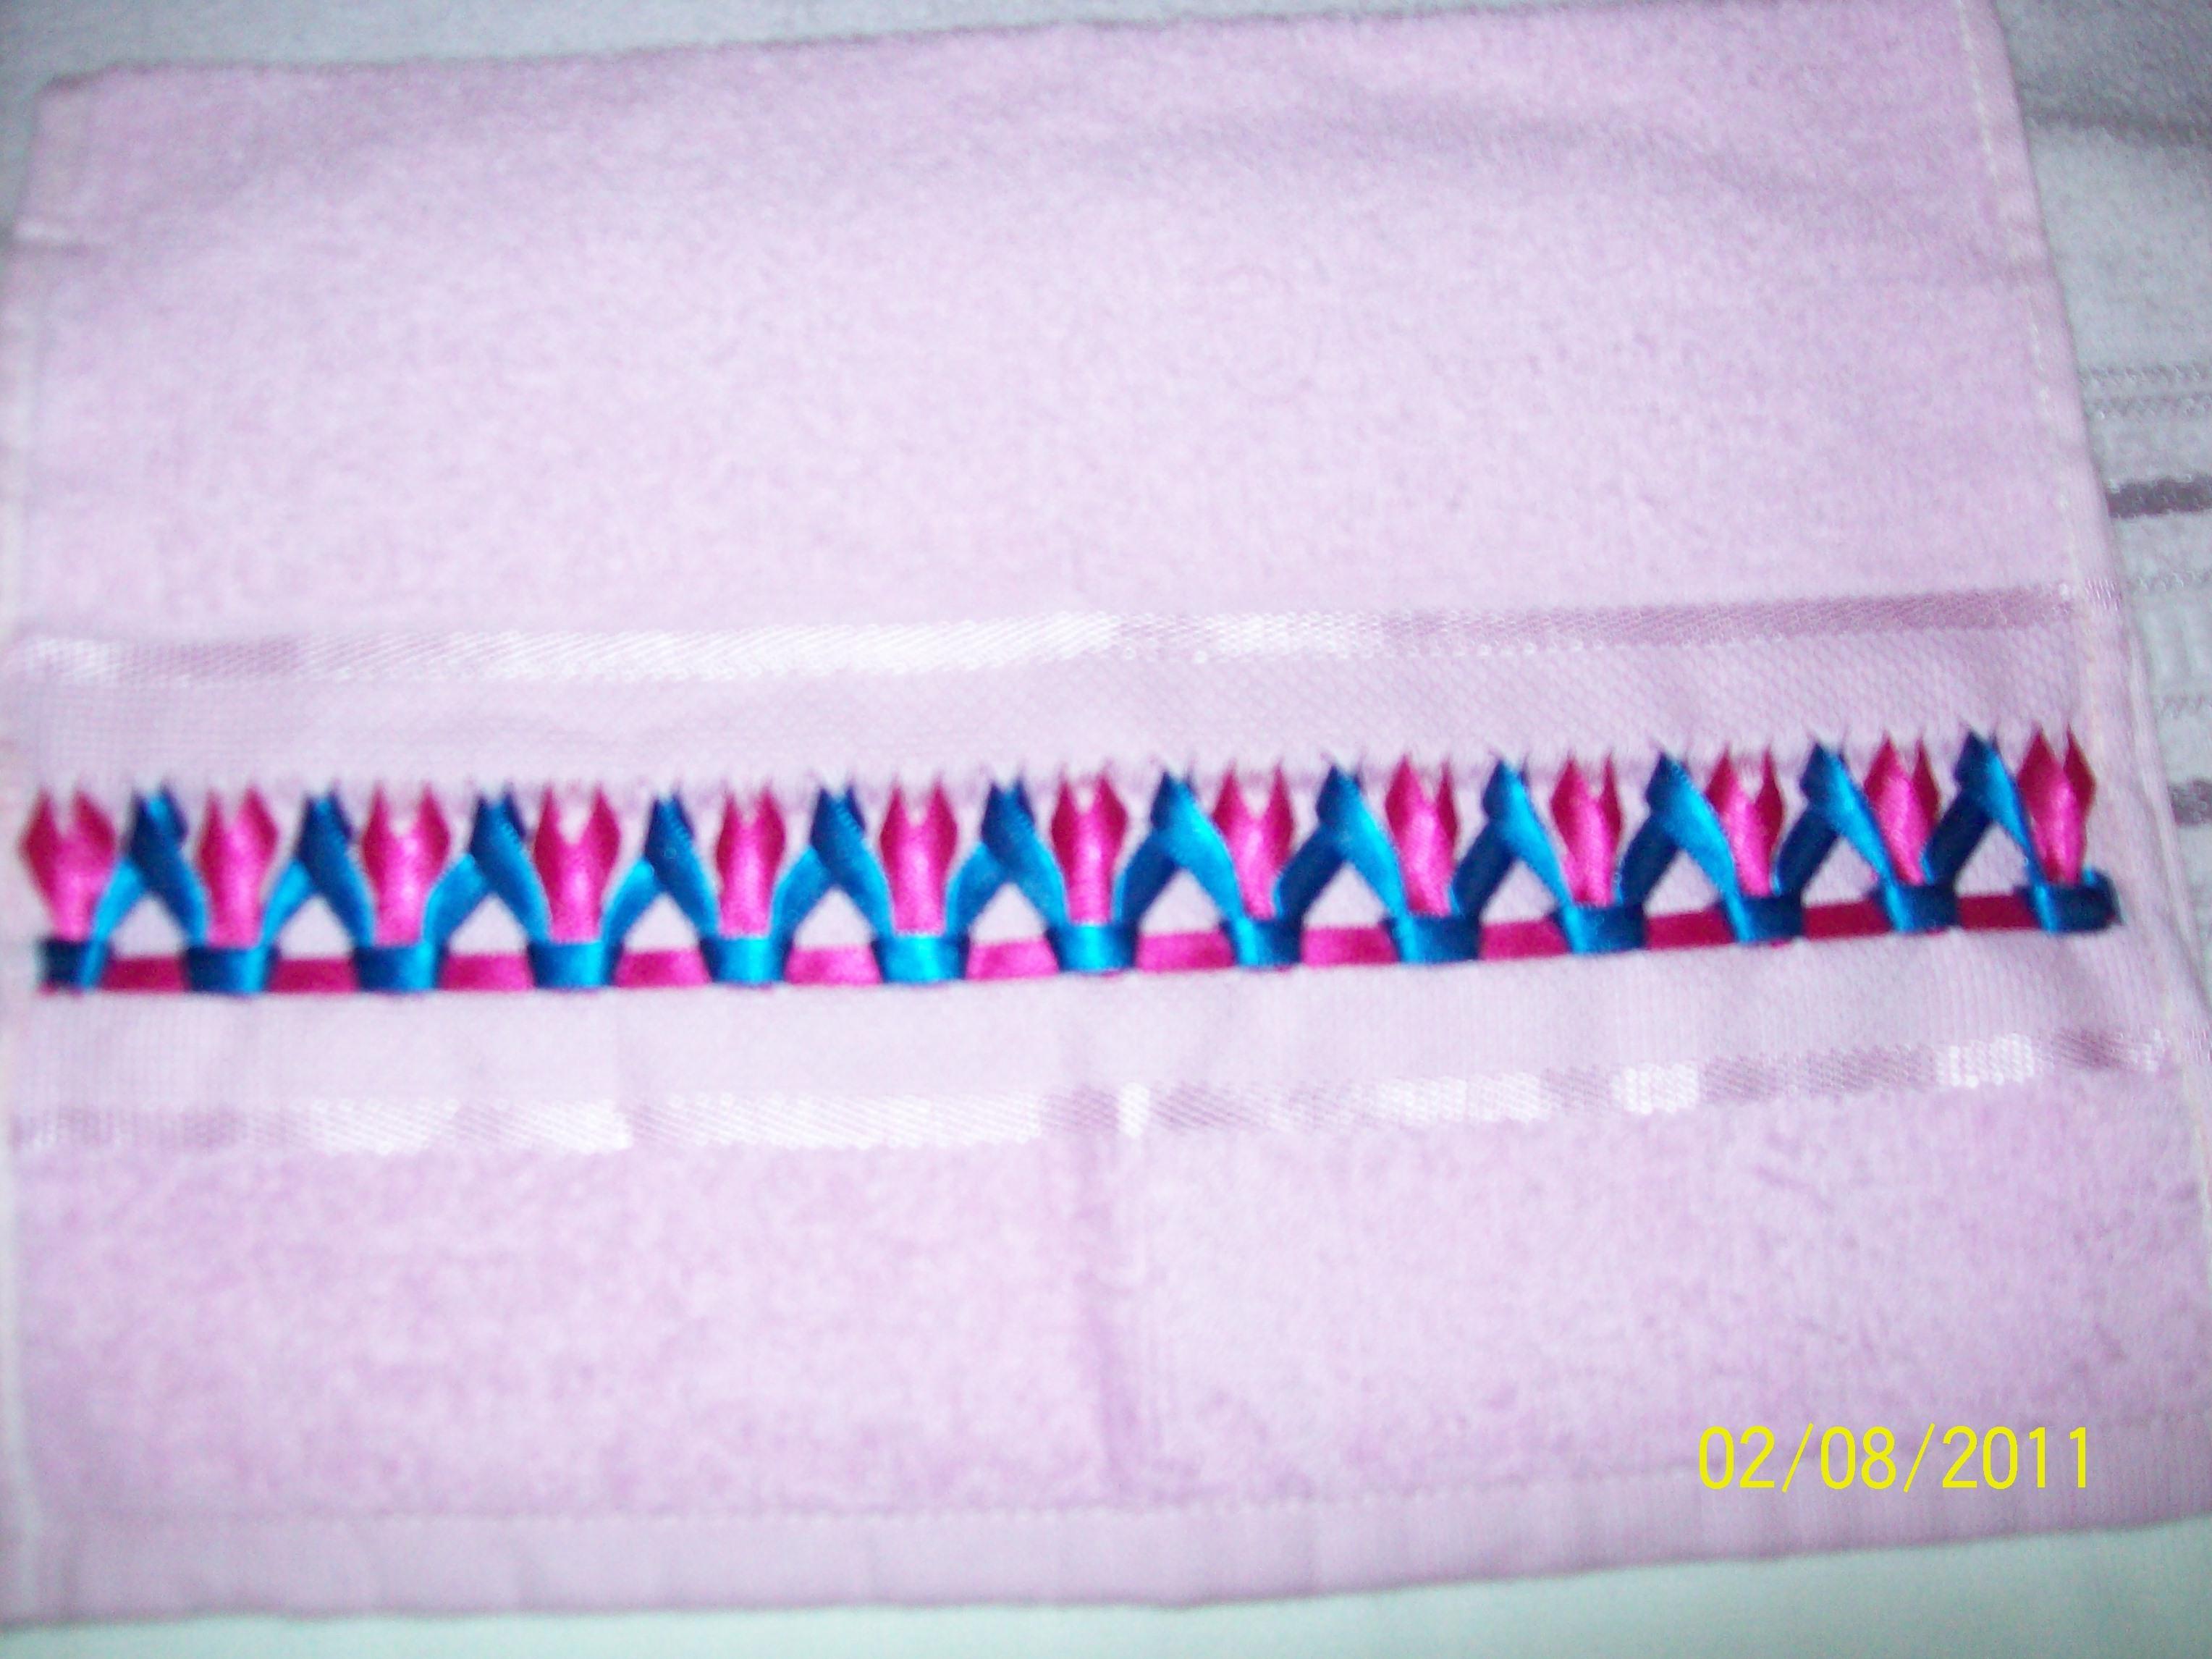 decoracao toalha lavabo:toalha bordado toalha lavabo trancado em fitas fita toalha lavabo